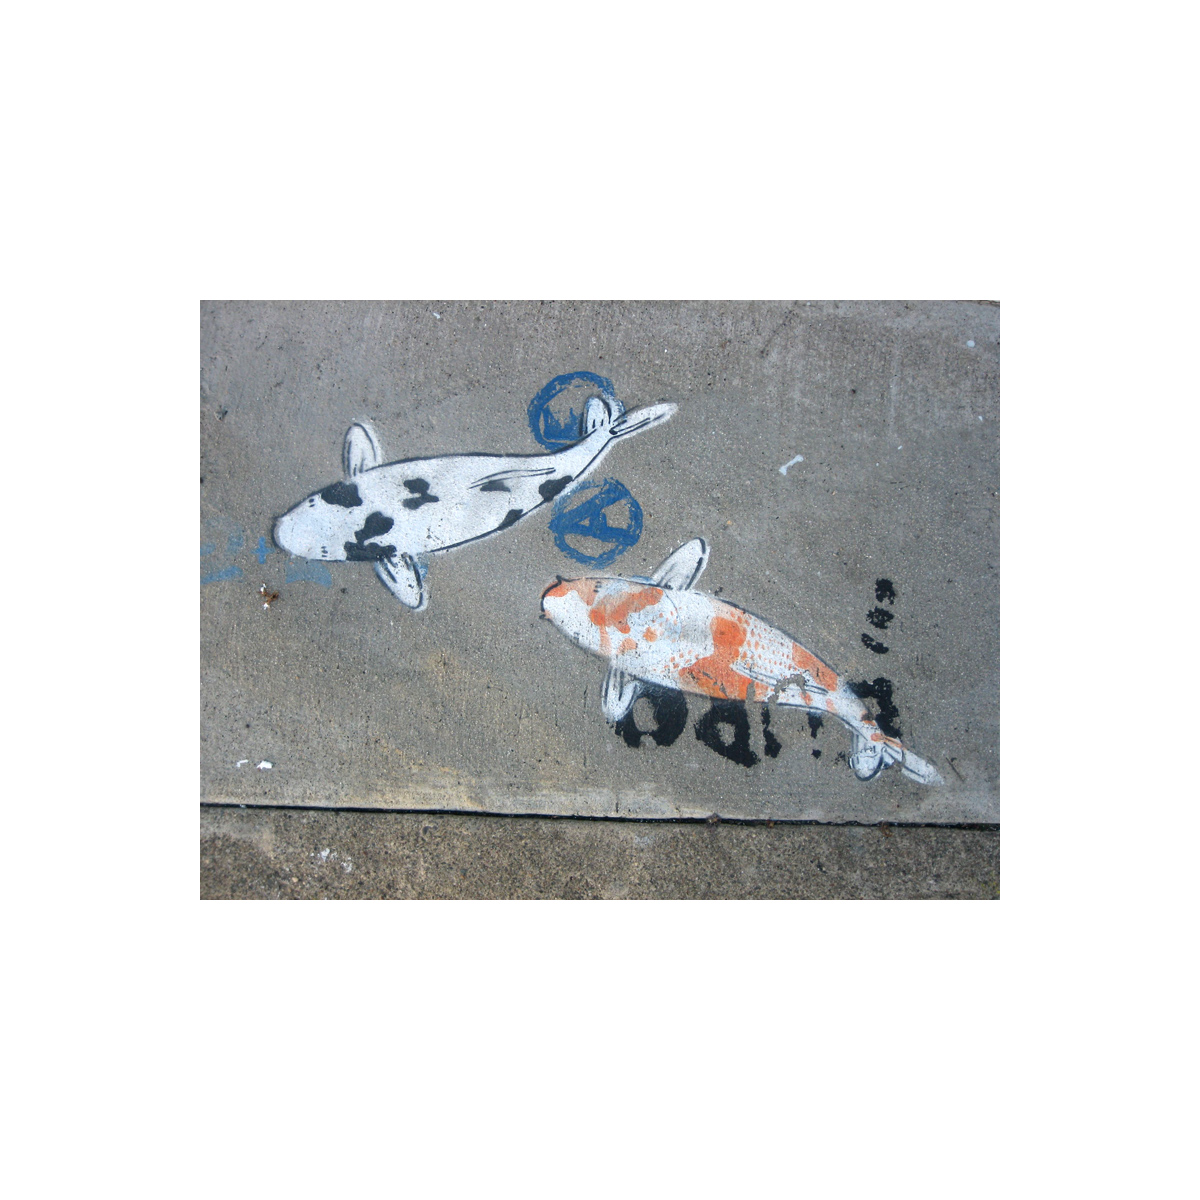 24th Street sidewalk art